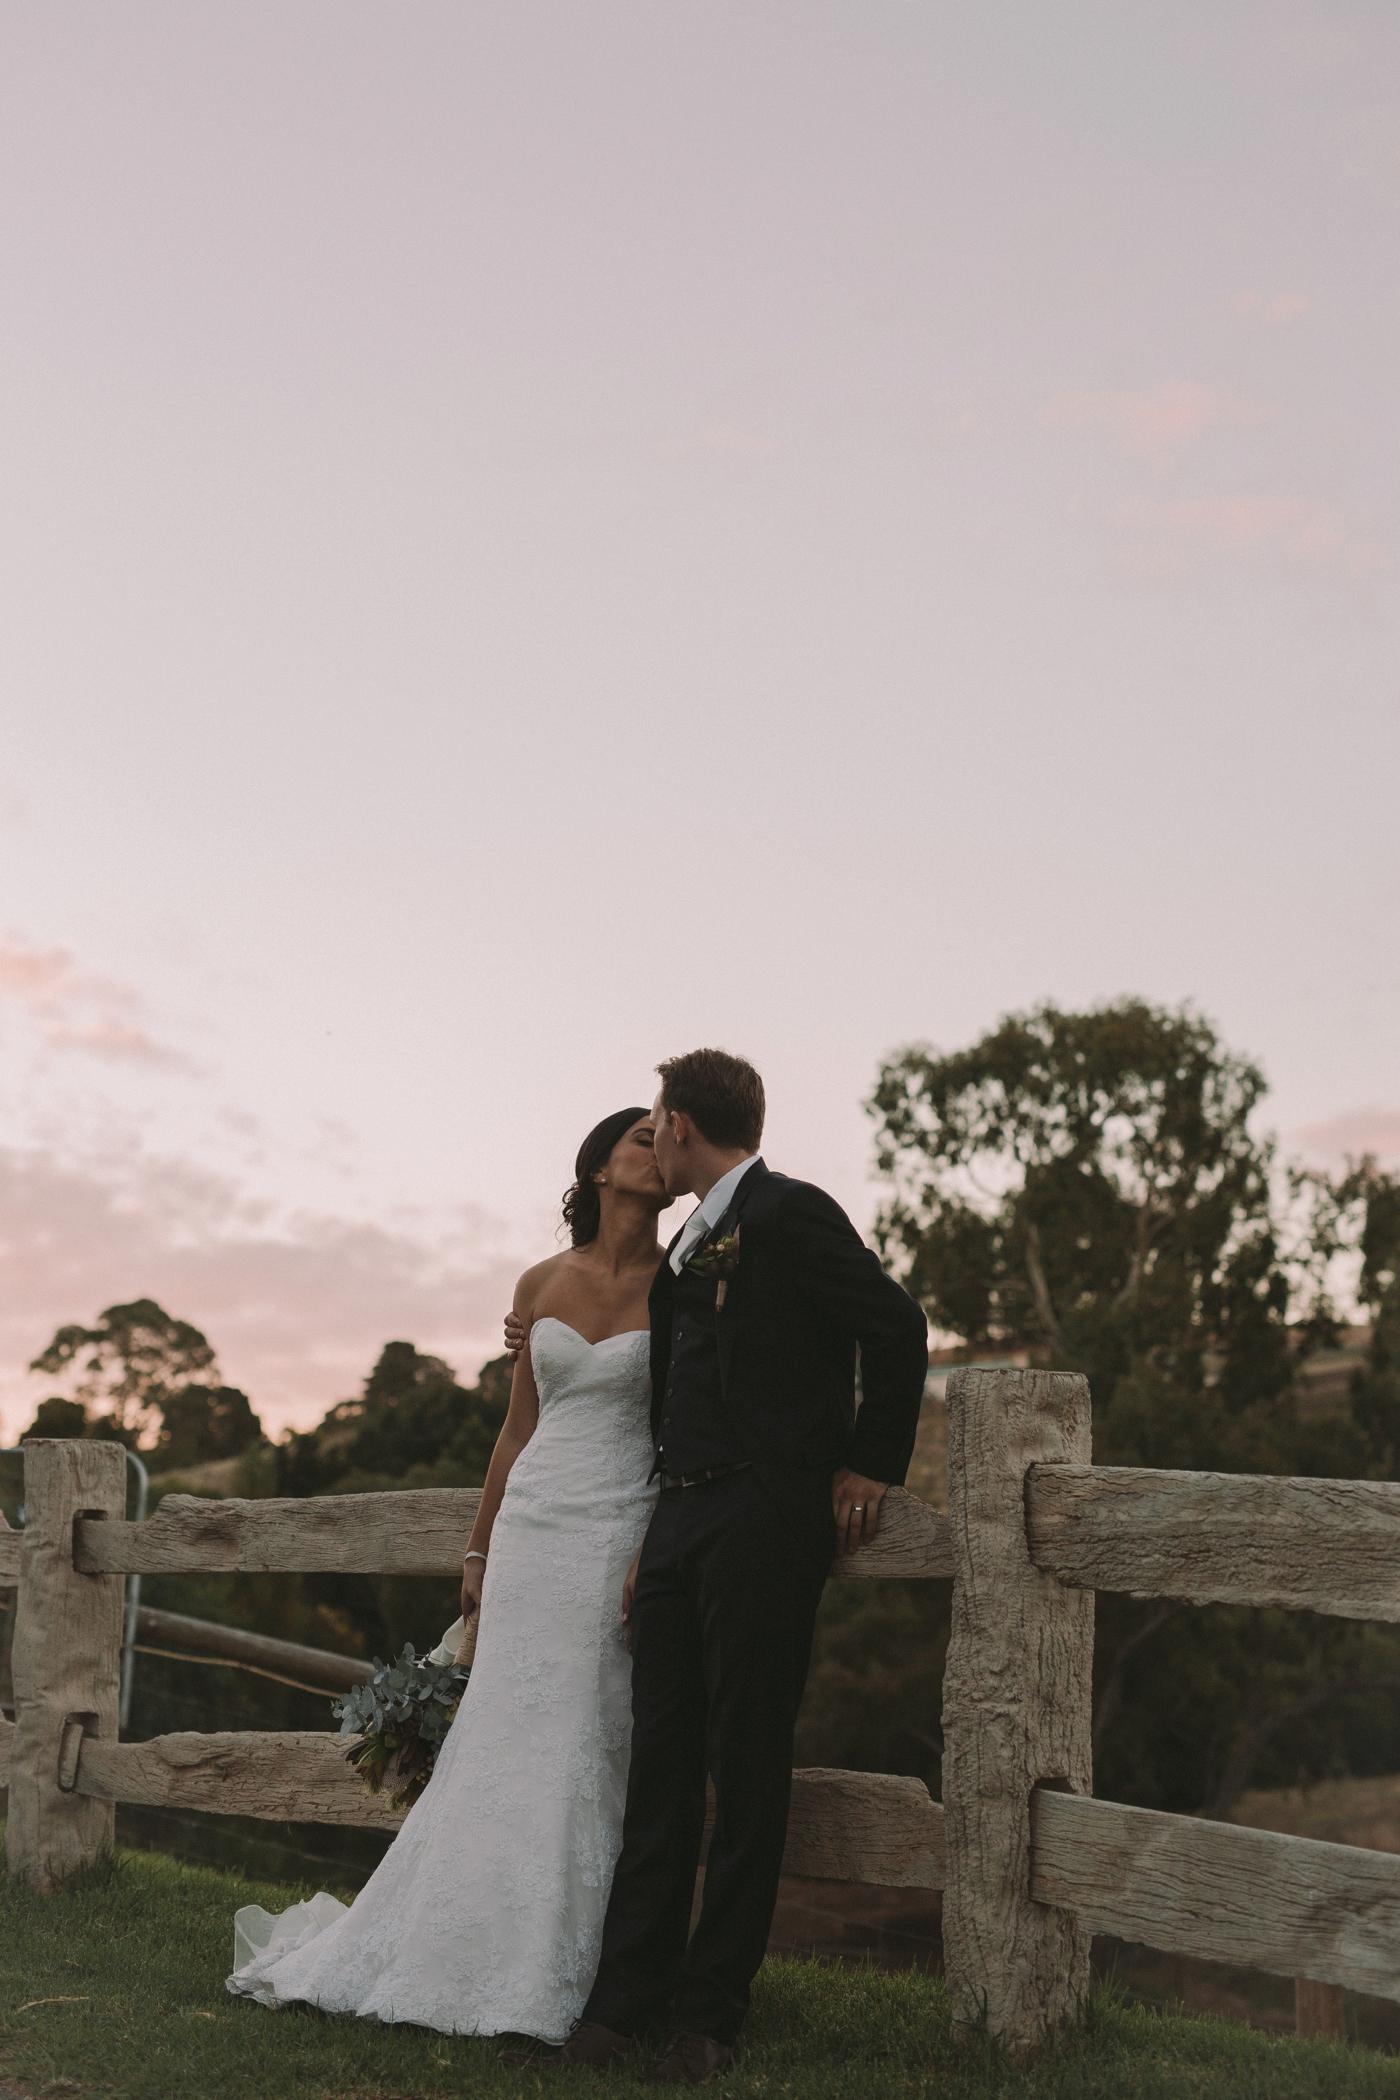 Jasmine and Adam - Natural wedding photographer in Adelaide - Candid Wedding Photographer Adelaide - www.katherineschultzphotography.com 49